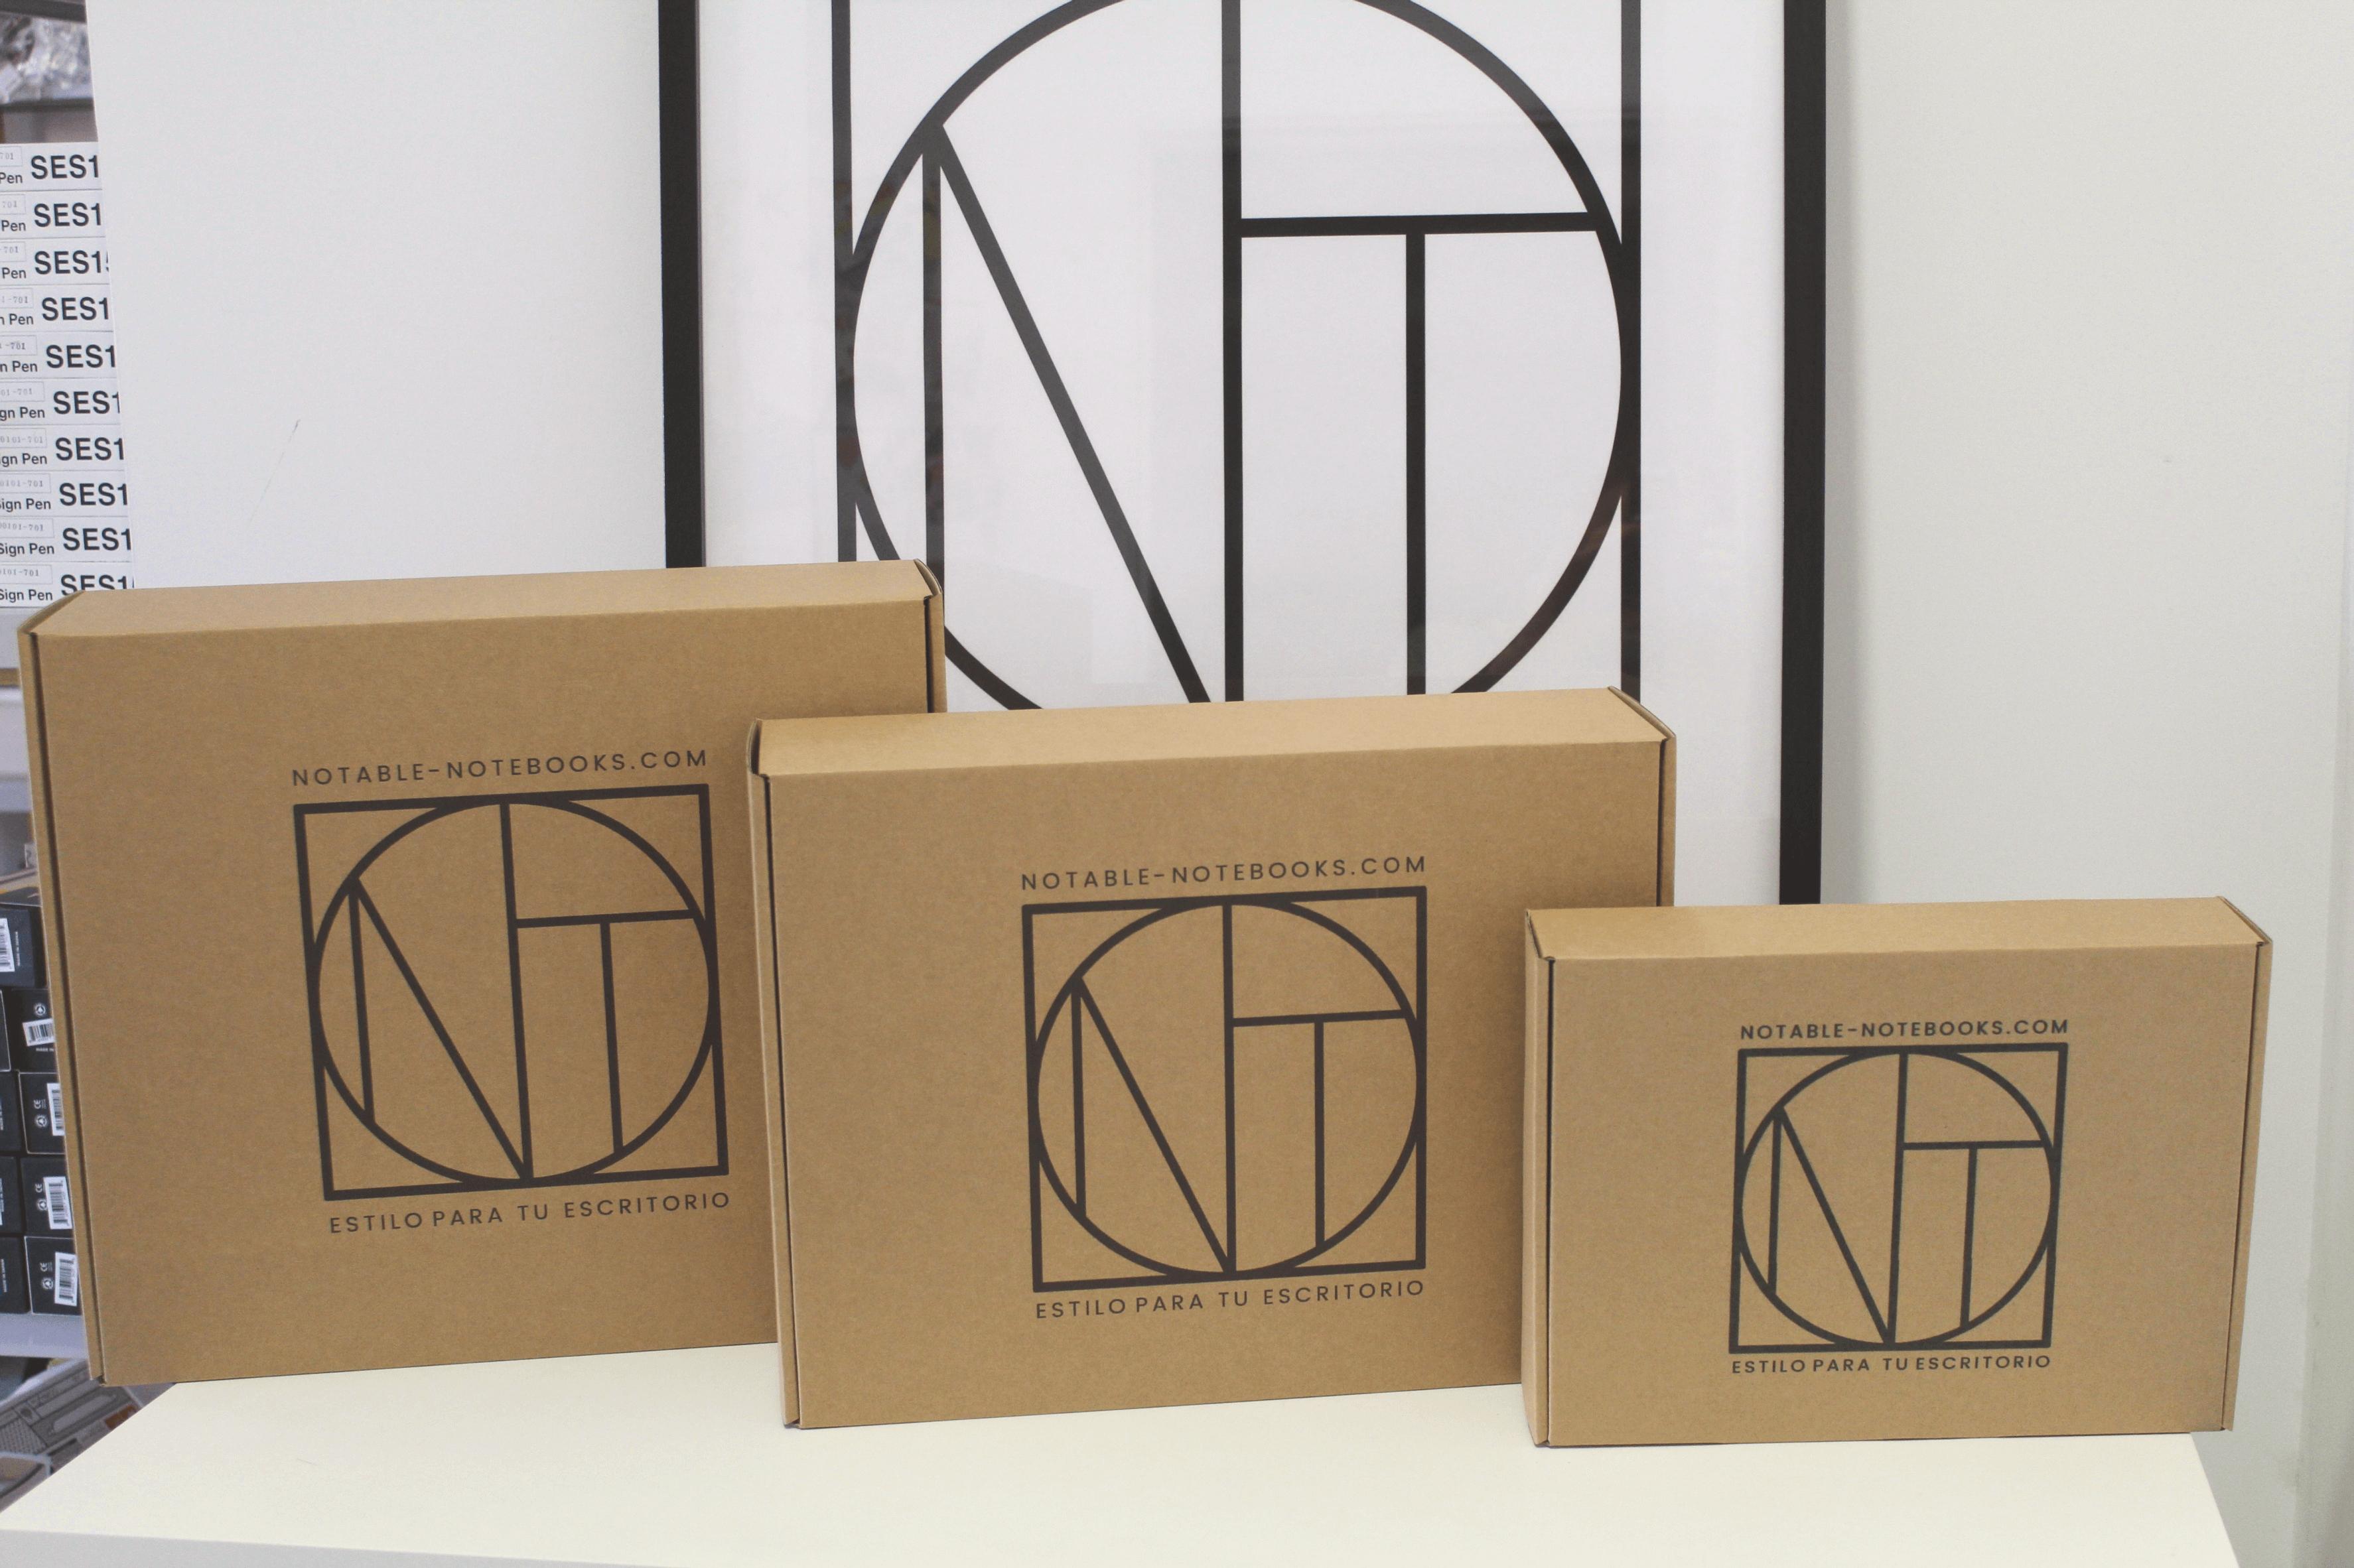 Cajas personalizadas de Notable Notebooks